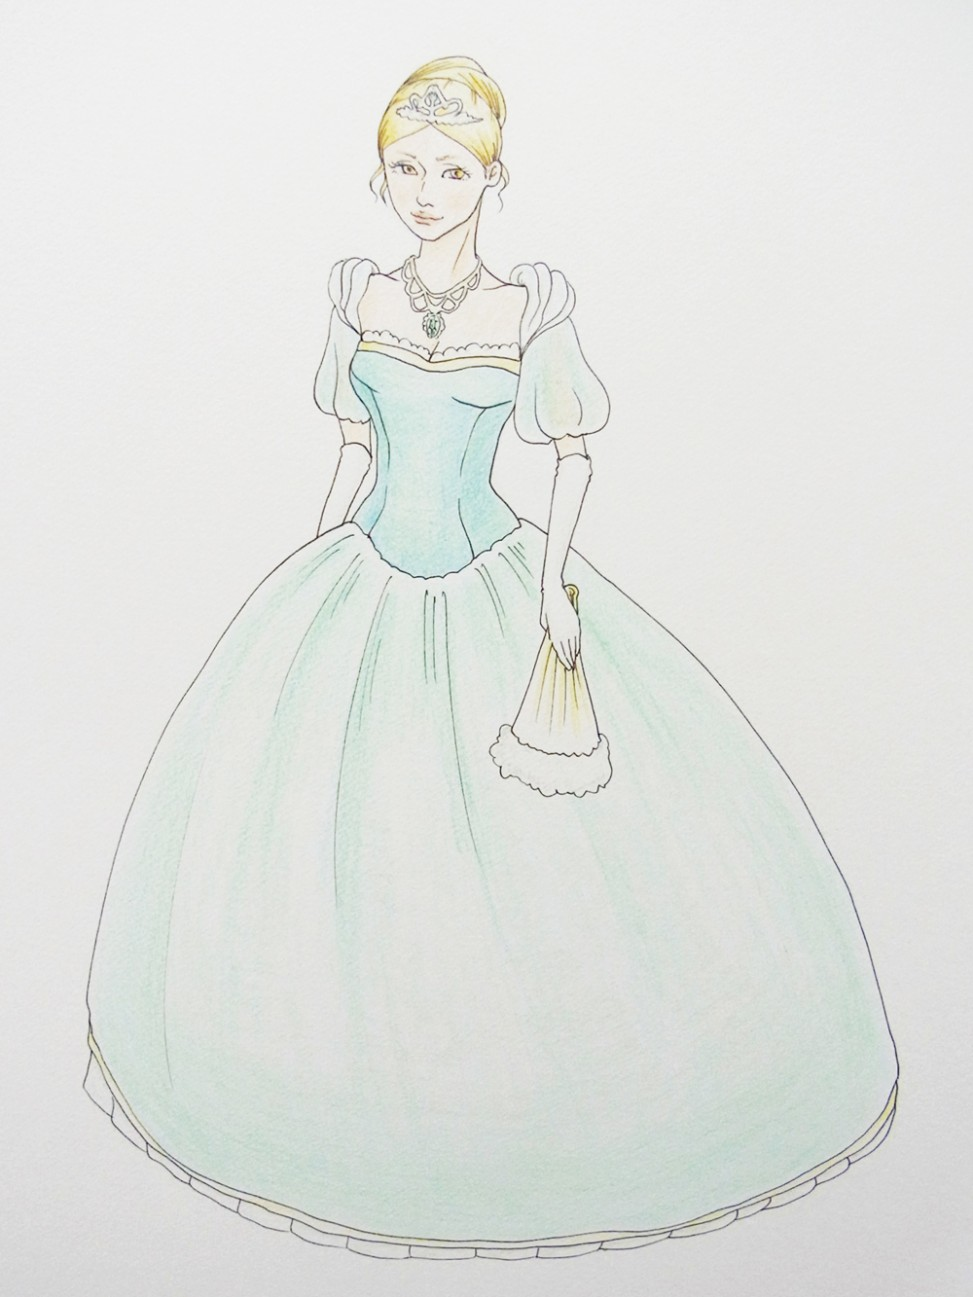 elizabeth_illustration_image